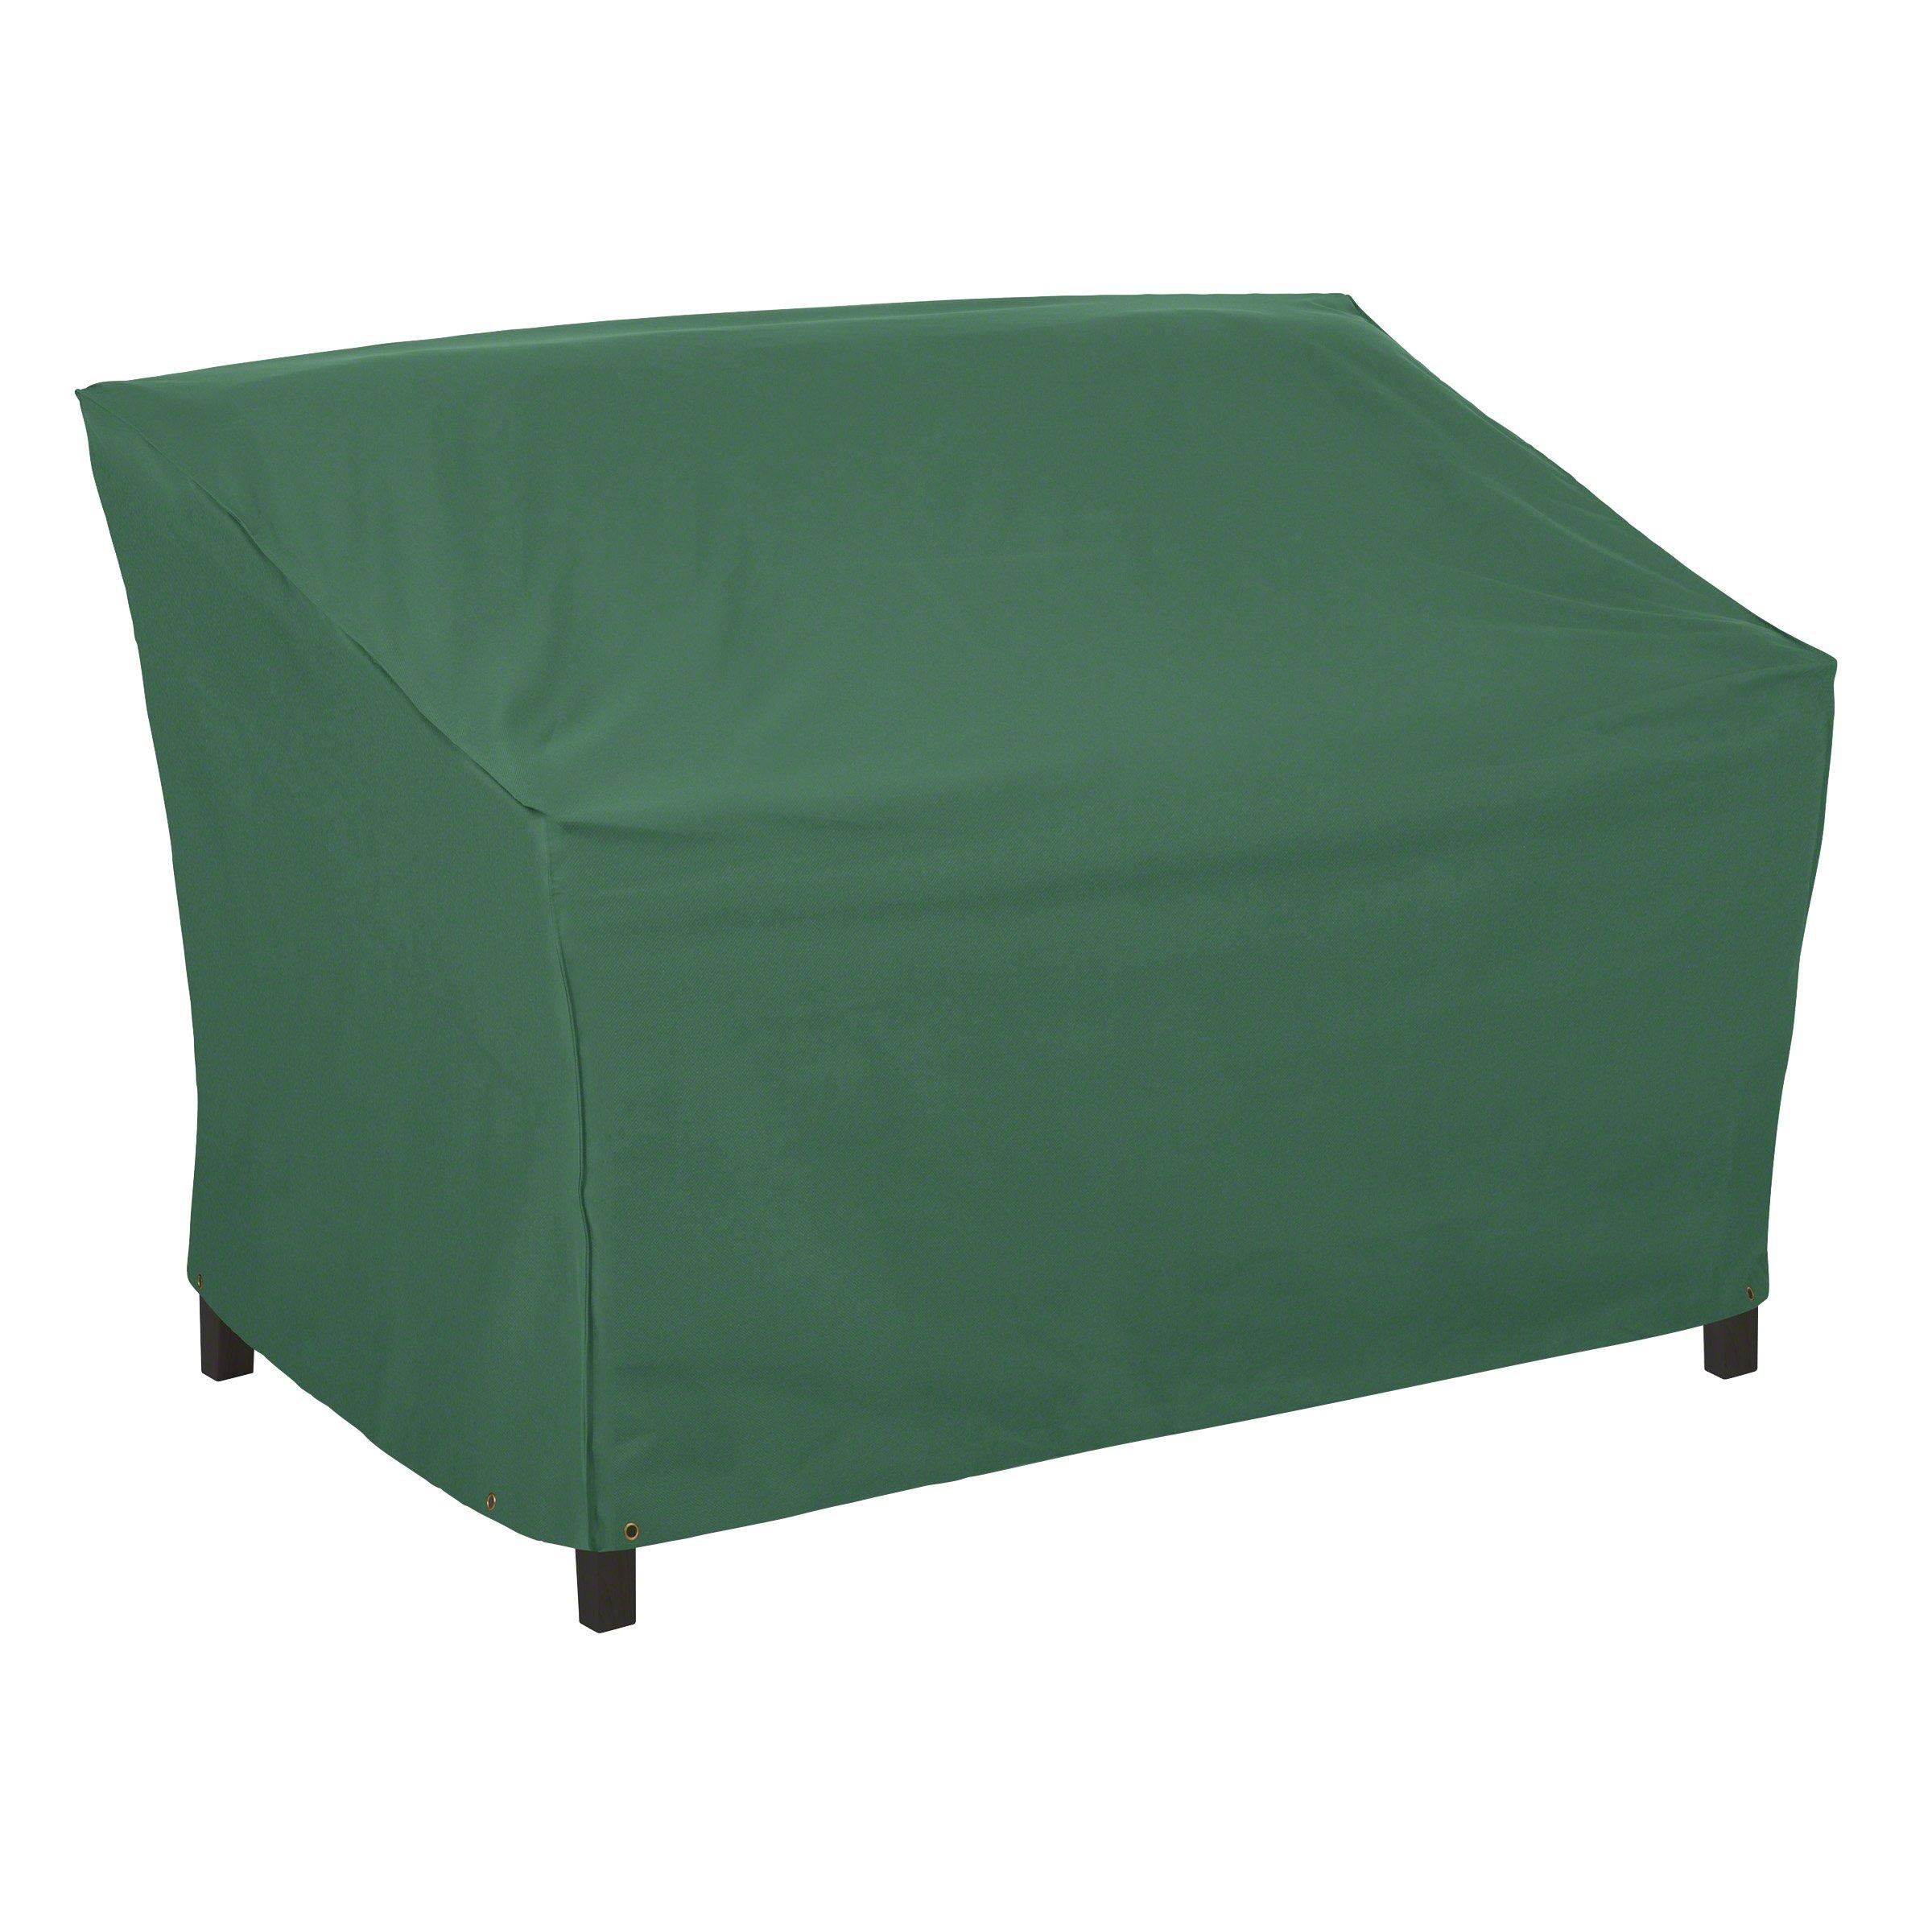 Classic Accessories 55-444-011101-11 Atrium Patio Sofa Cover, 76-Inch, Green